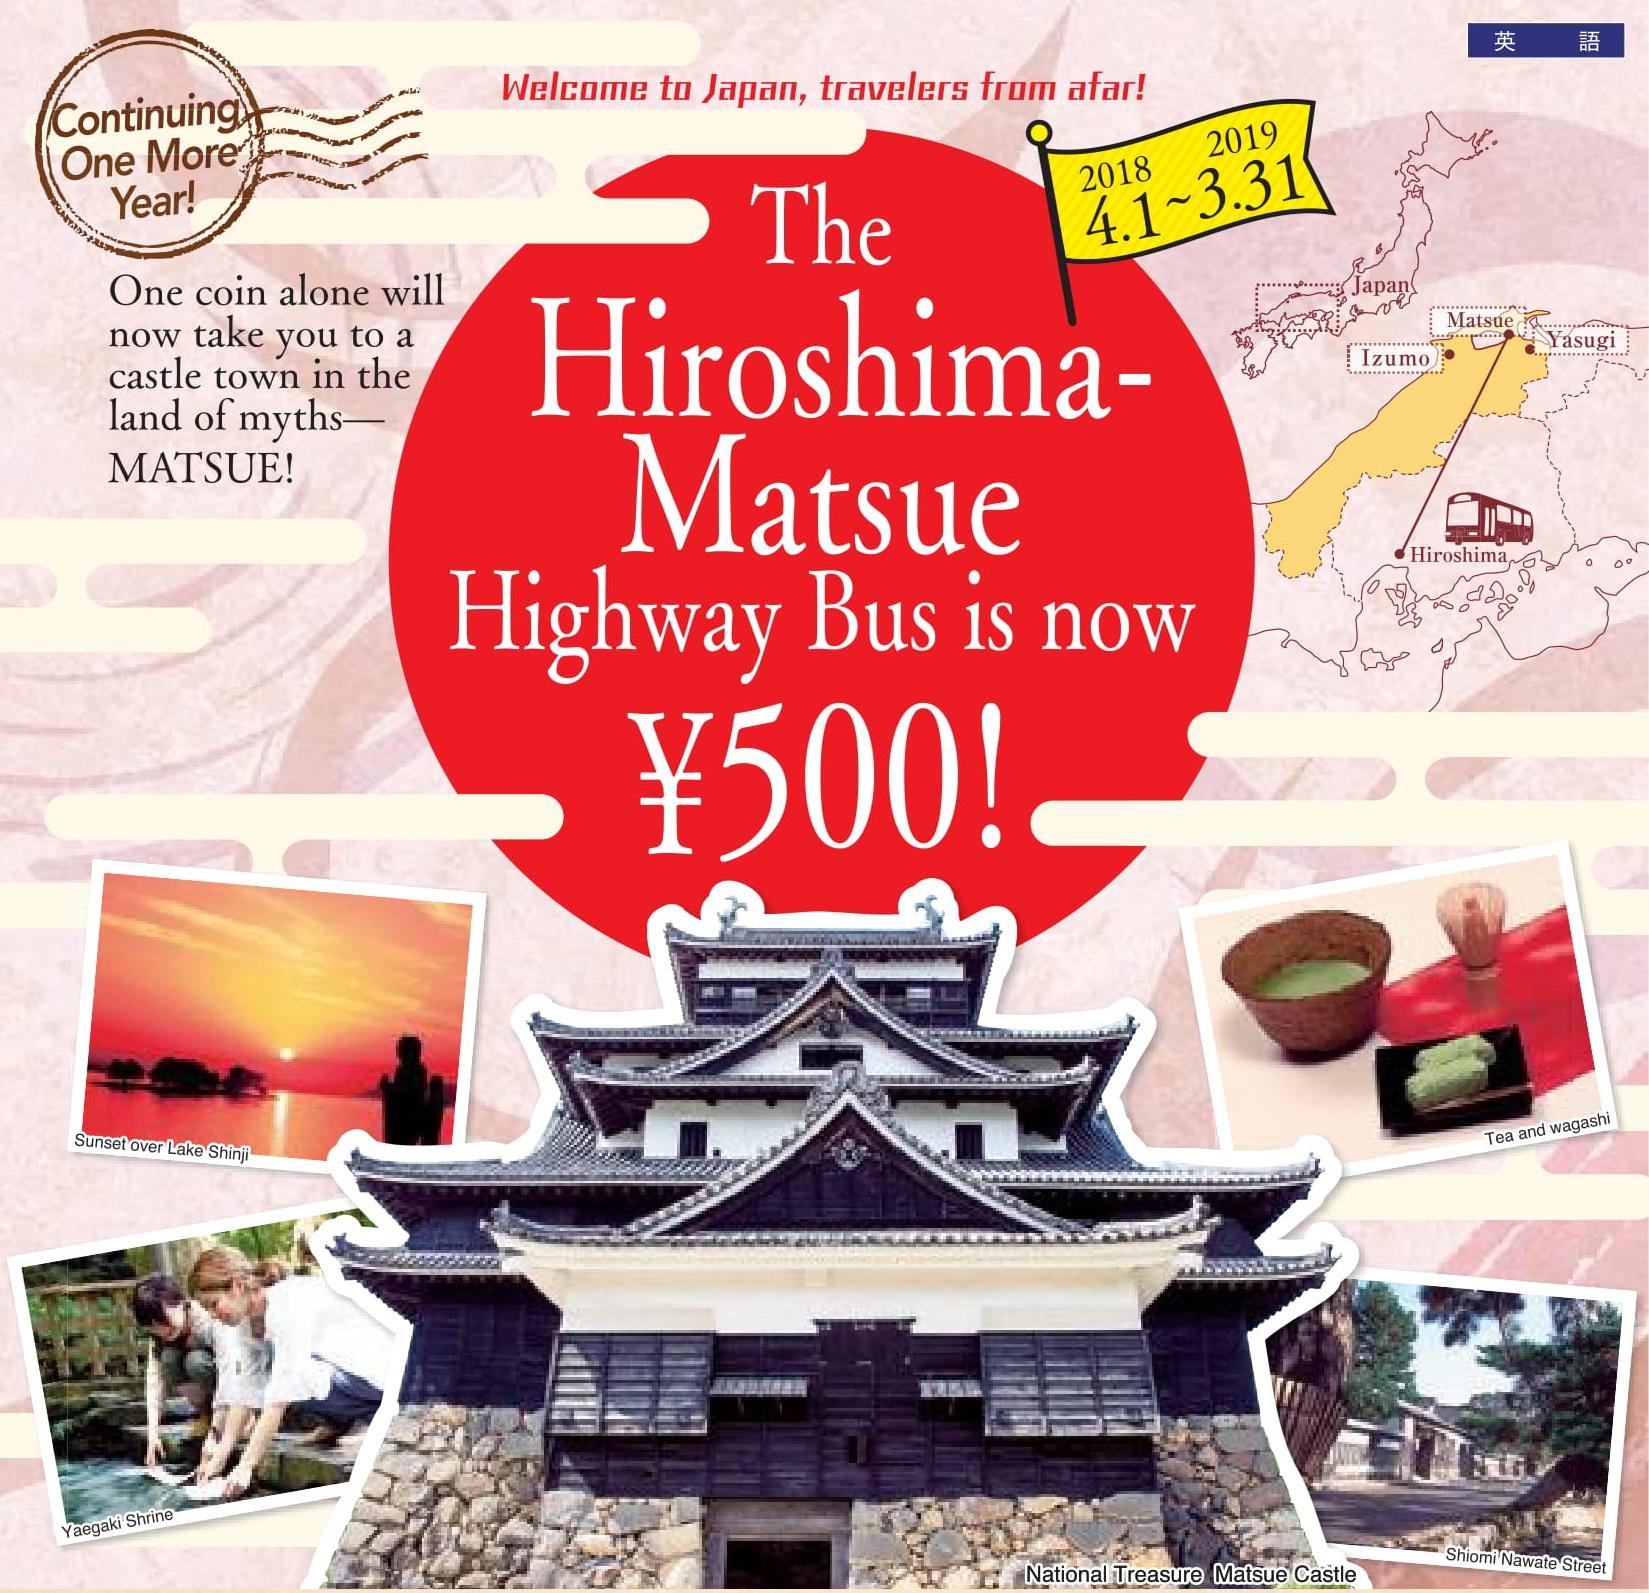 500 YEN BUS Matsue - Hiroshima